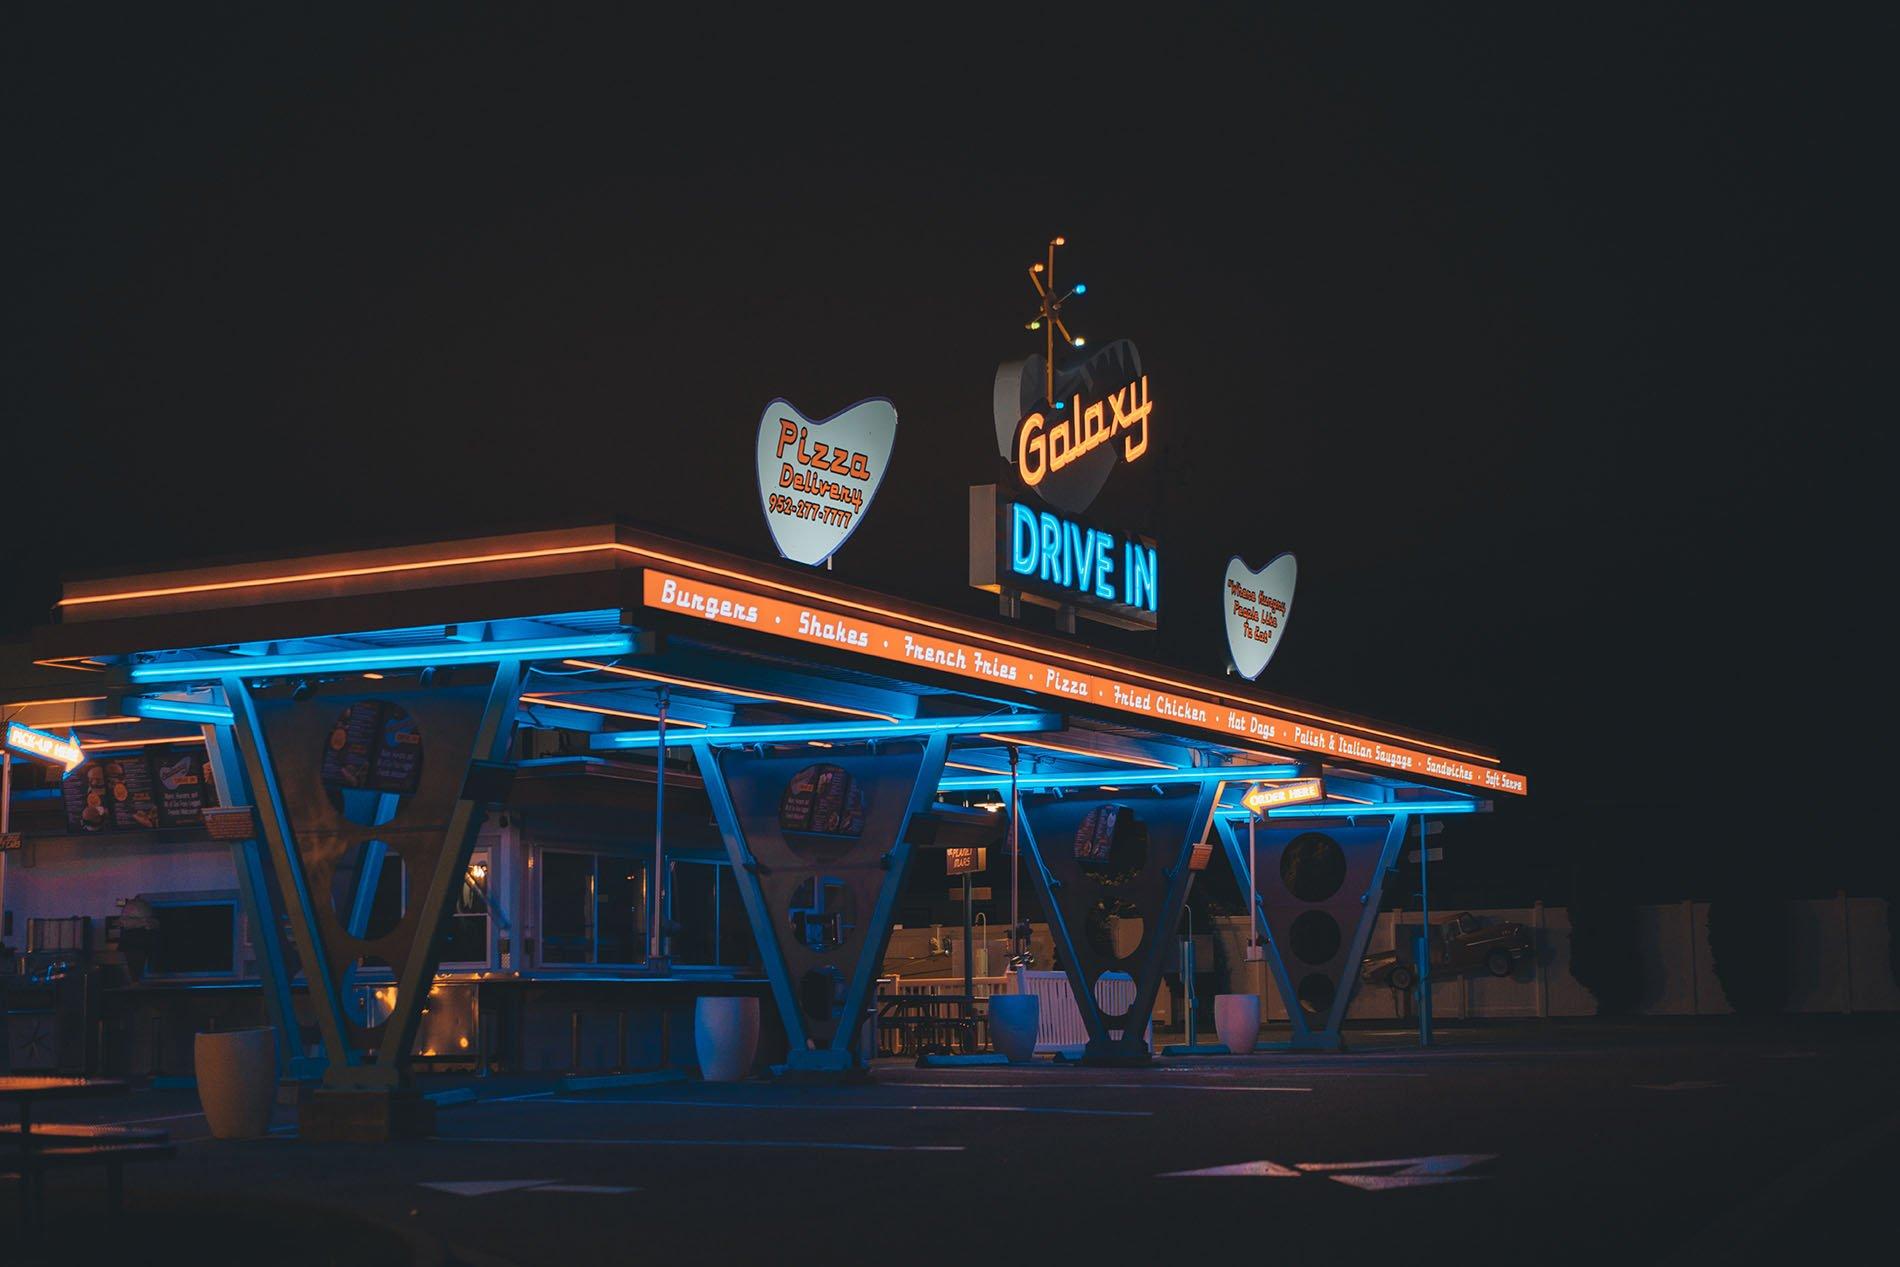 American Diner Burger Restaurant American Diner Restaurant - Our History 5